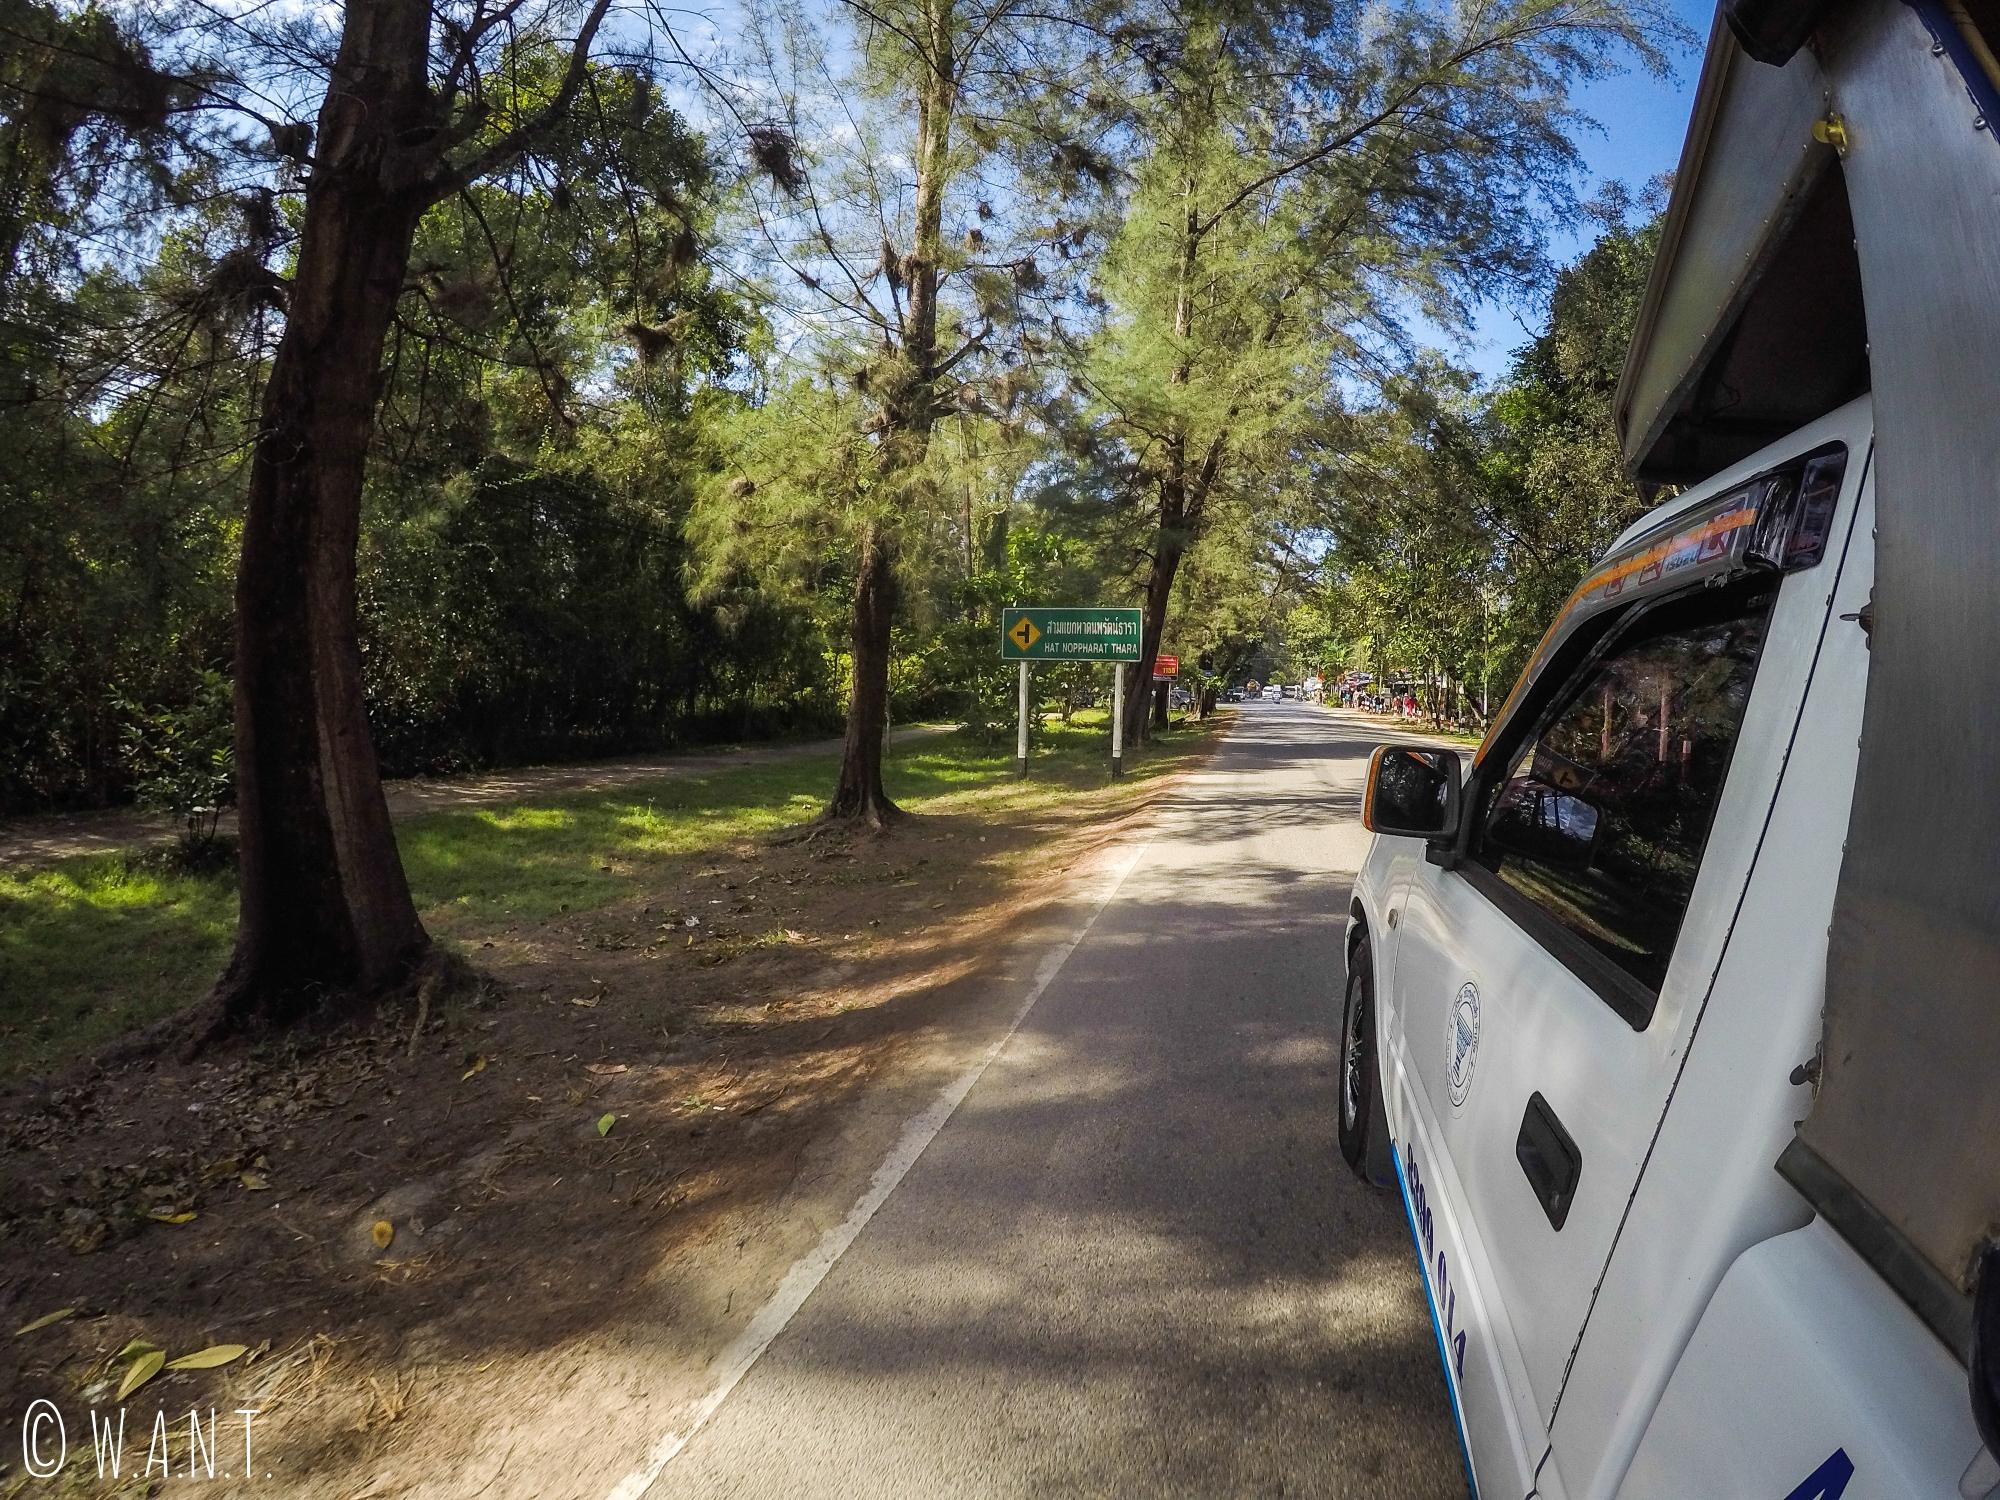 Trajet en songthaew de Krabi town à Ao Nang